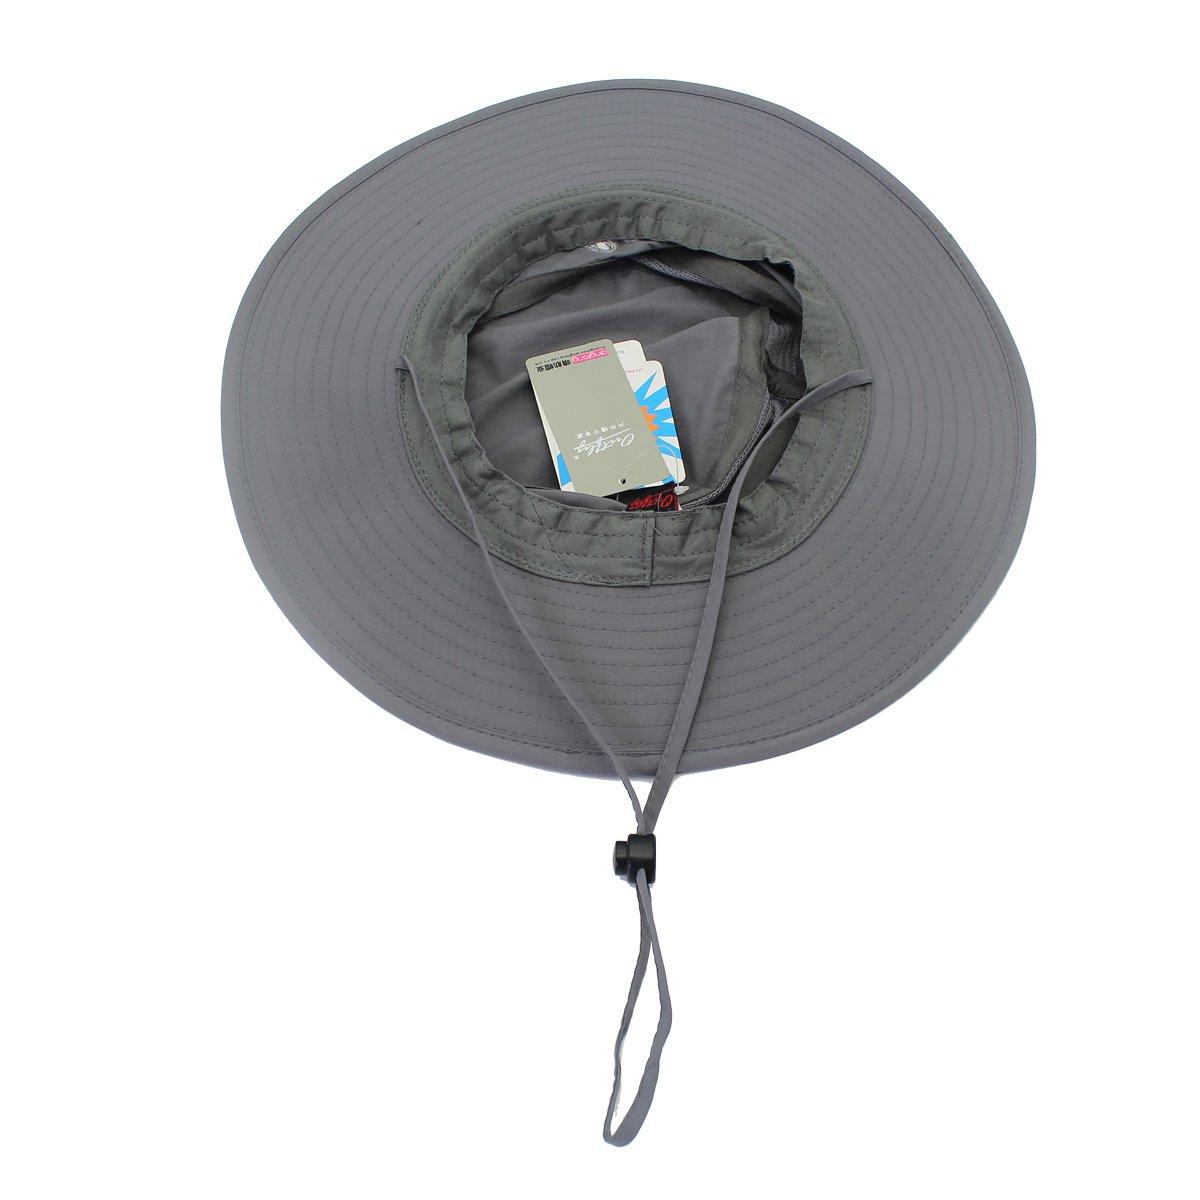 UV Protection Sun Cap Outdoor Bucket Mesh Hat 56-61cm EONPOW Windproof Fishing Hats UPF50